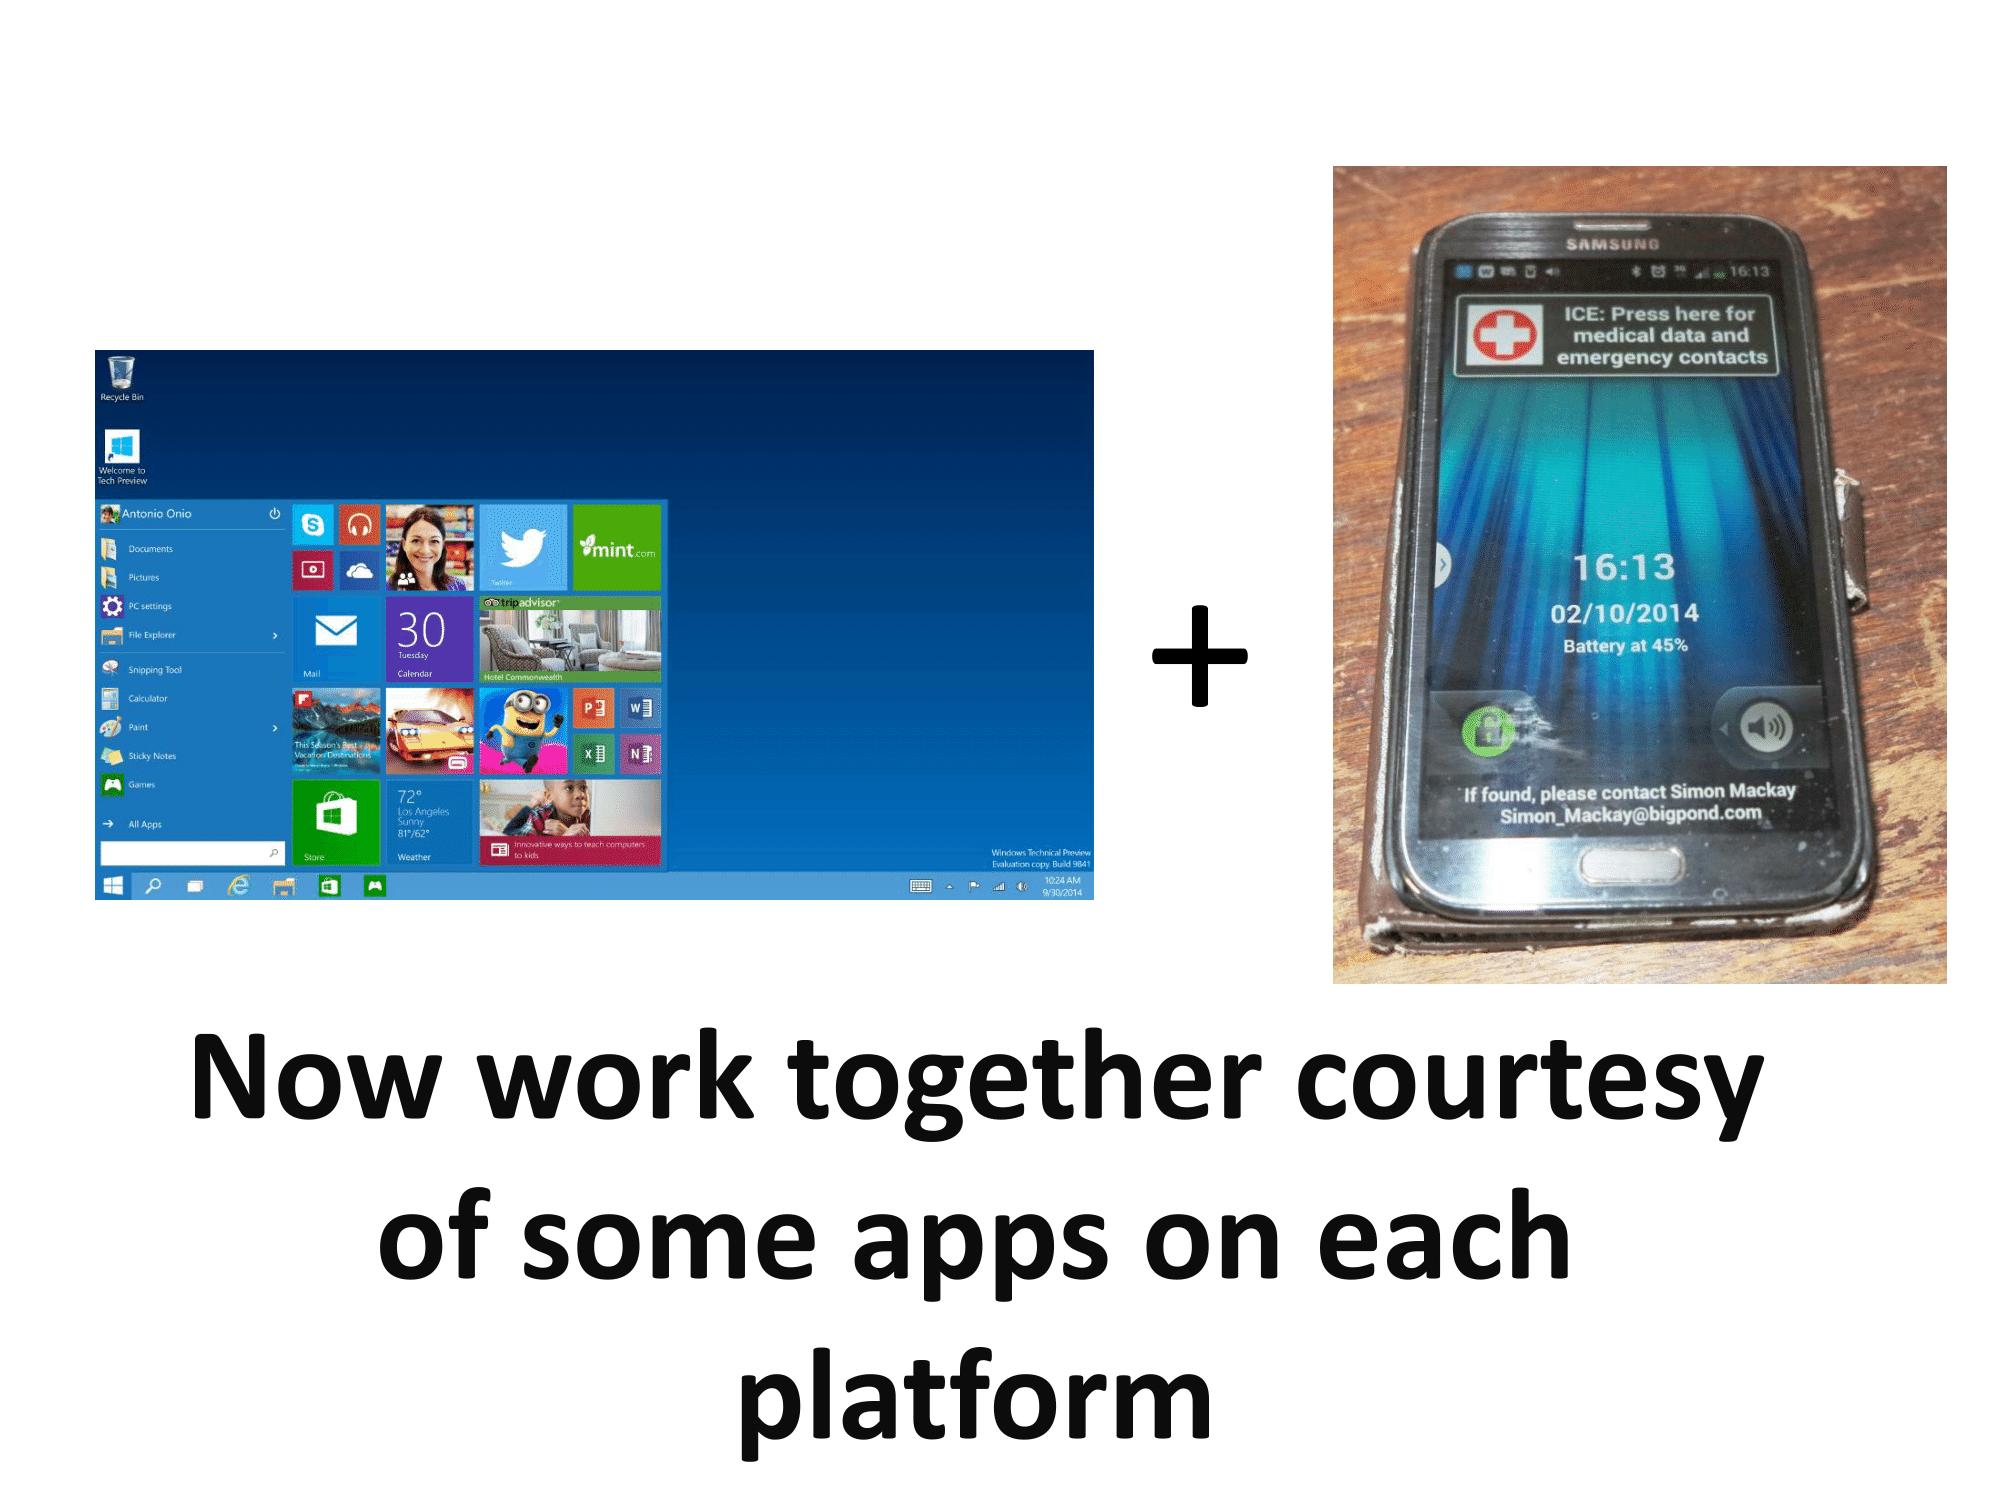 Windows 10 and your smartphone platform work together-1